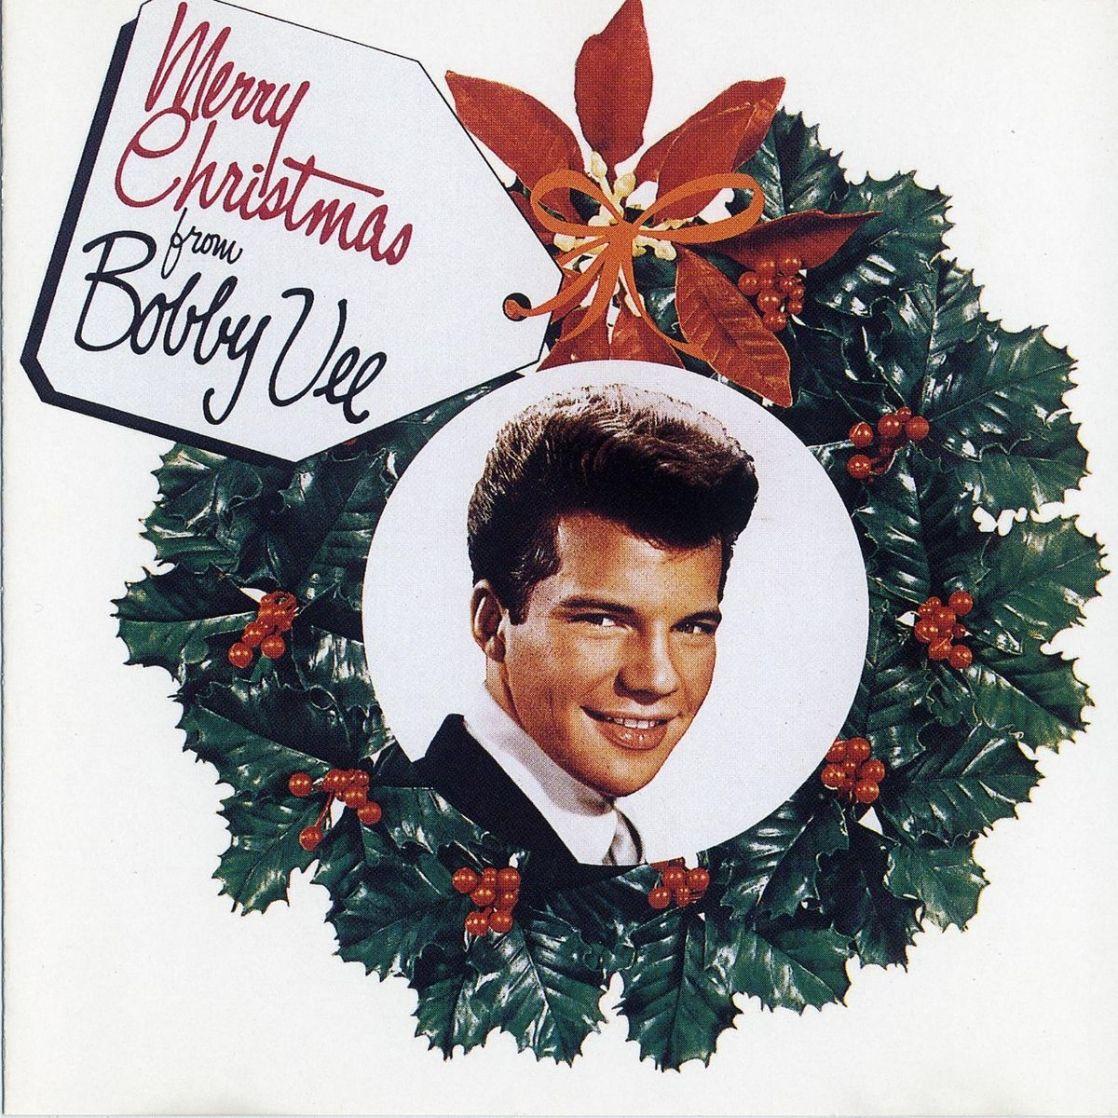 merry christmas header - Google Search | Christmas Ideas | Pinterest ...